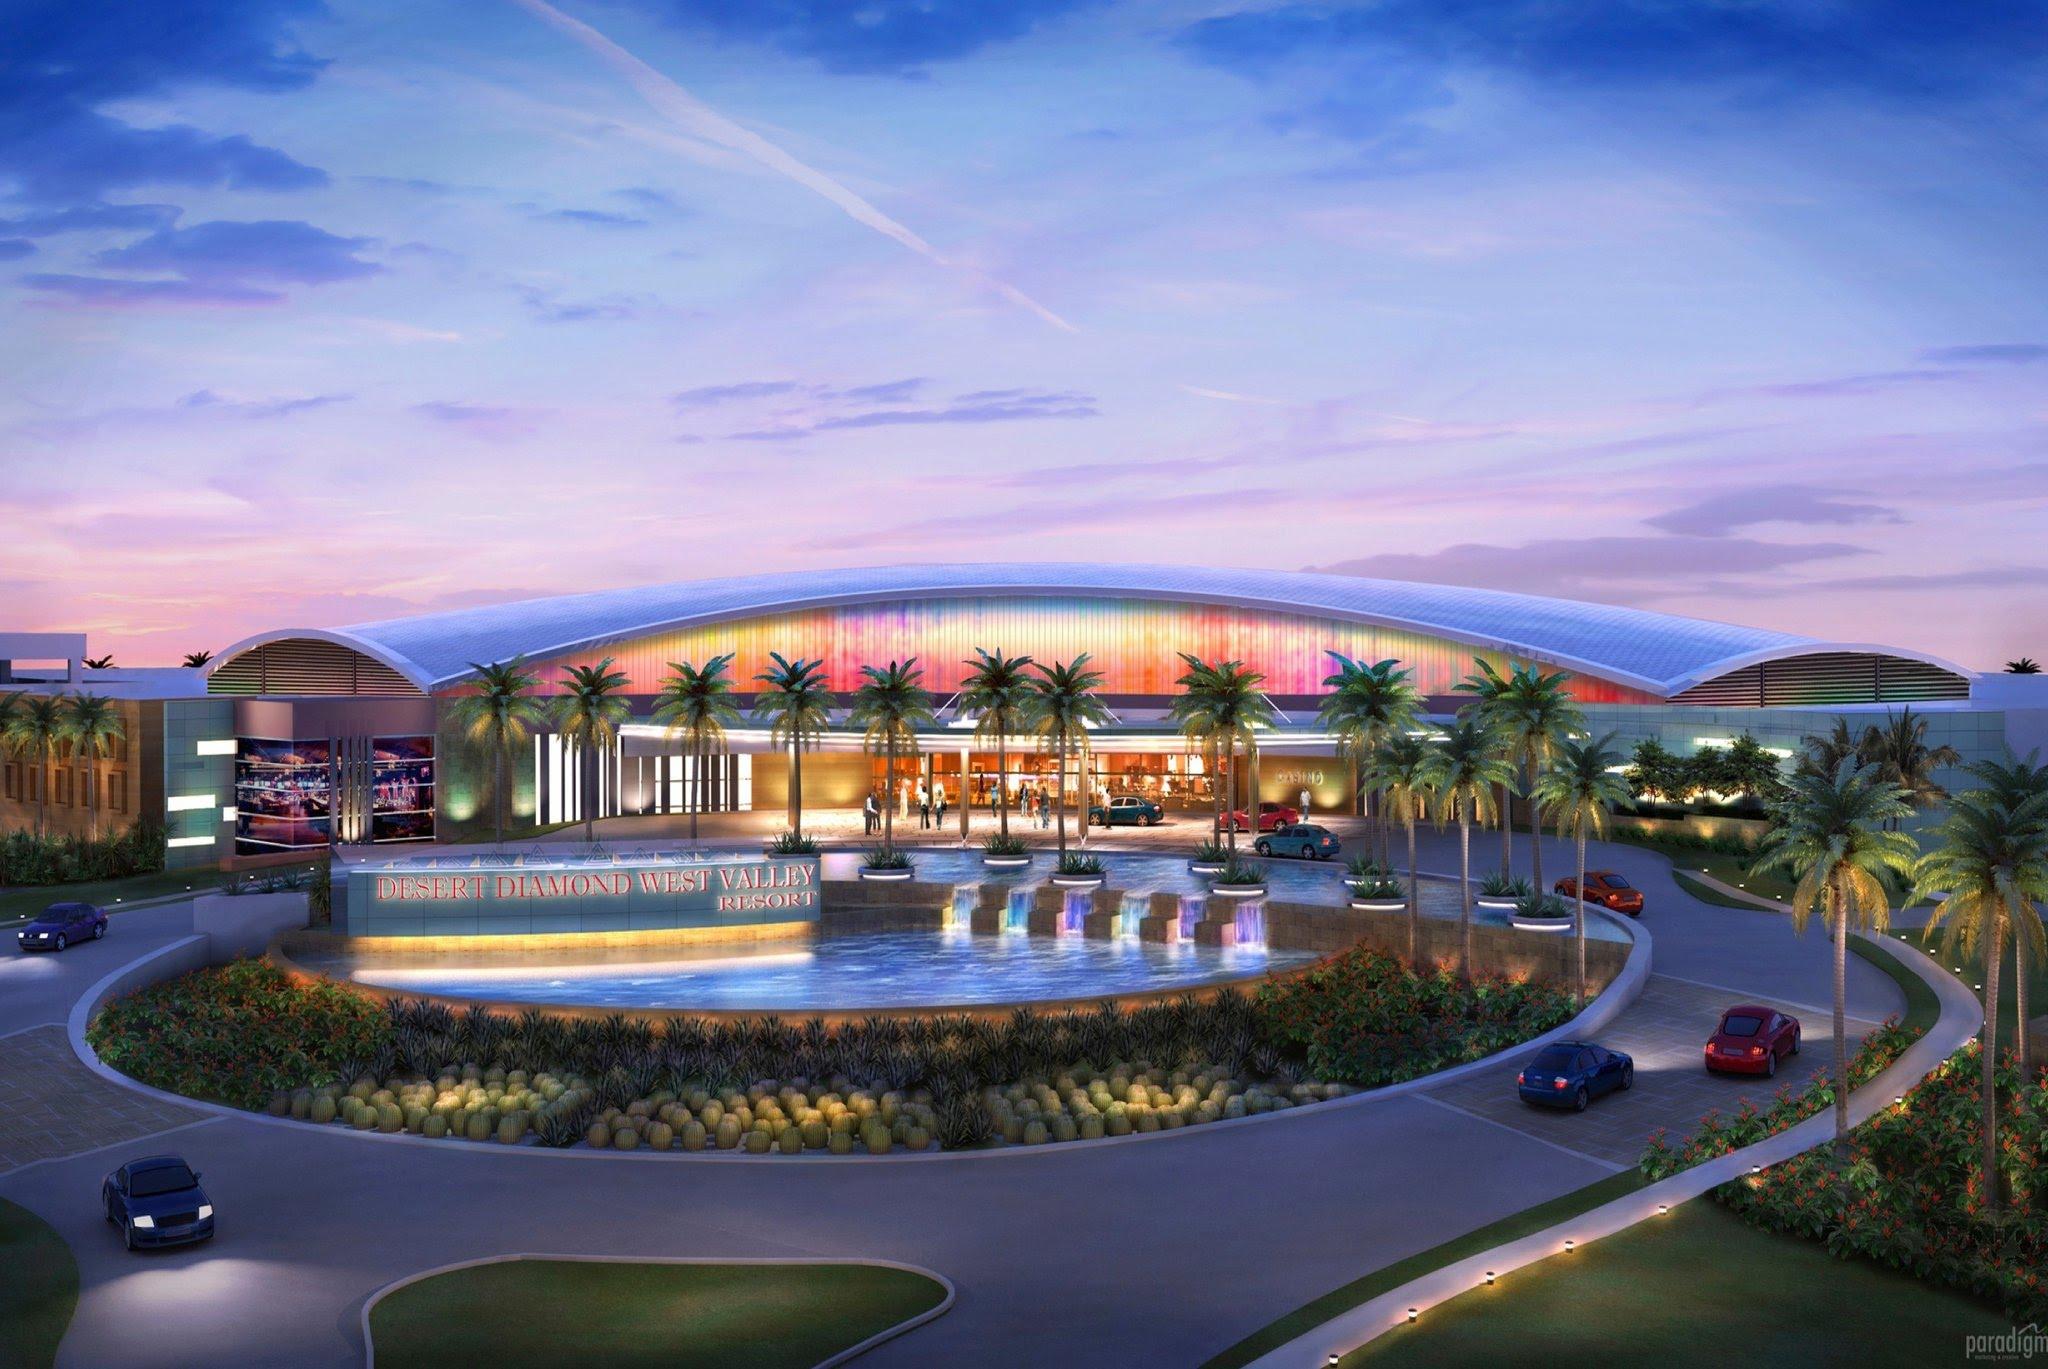 Tohono o odham glendale casino sun cruise casino boat